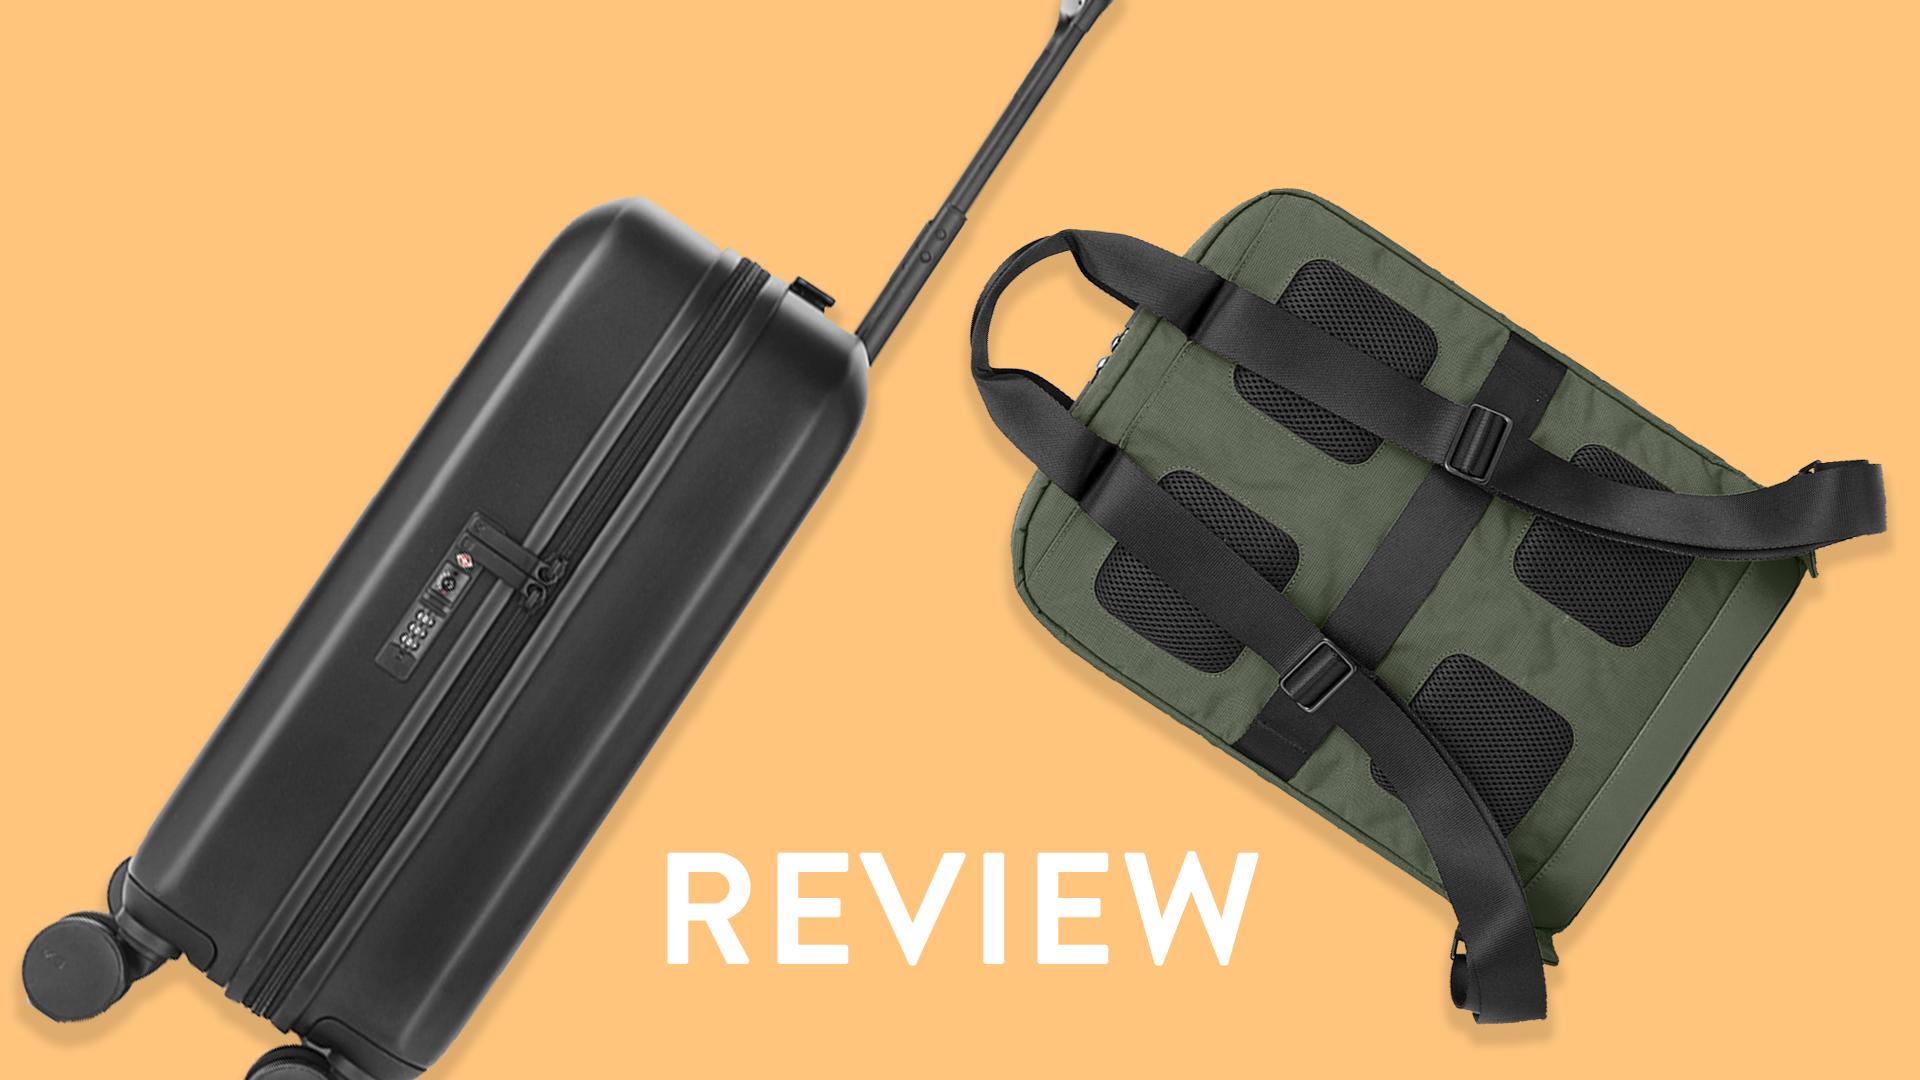 moleskine case and bag review.jpg